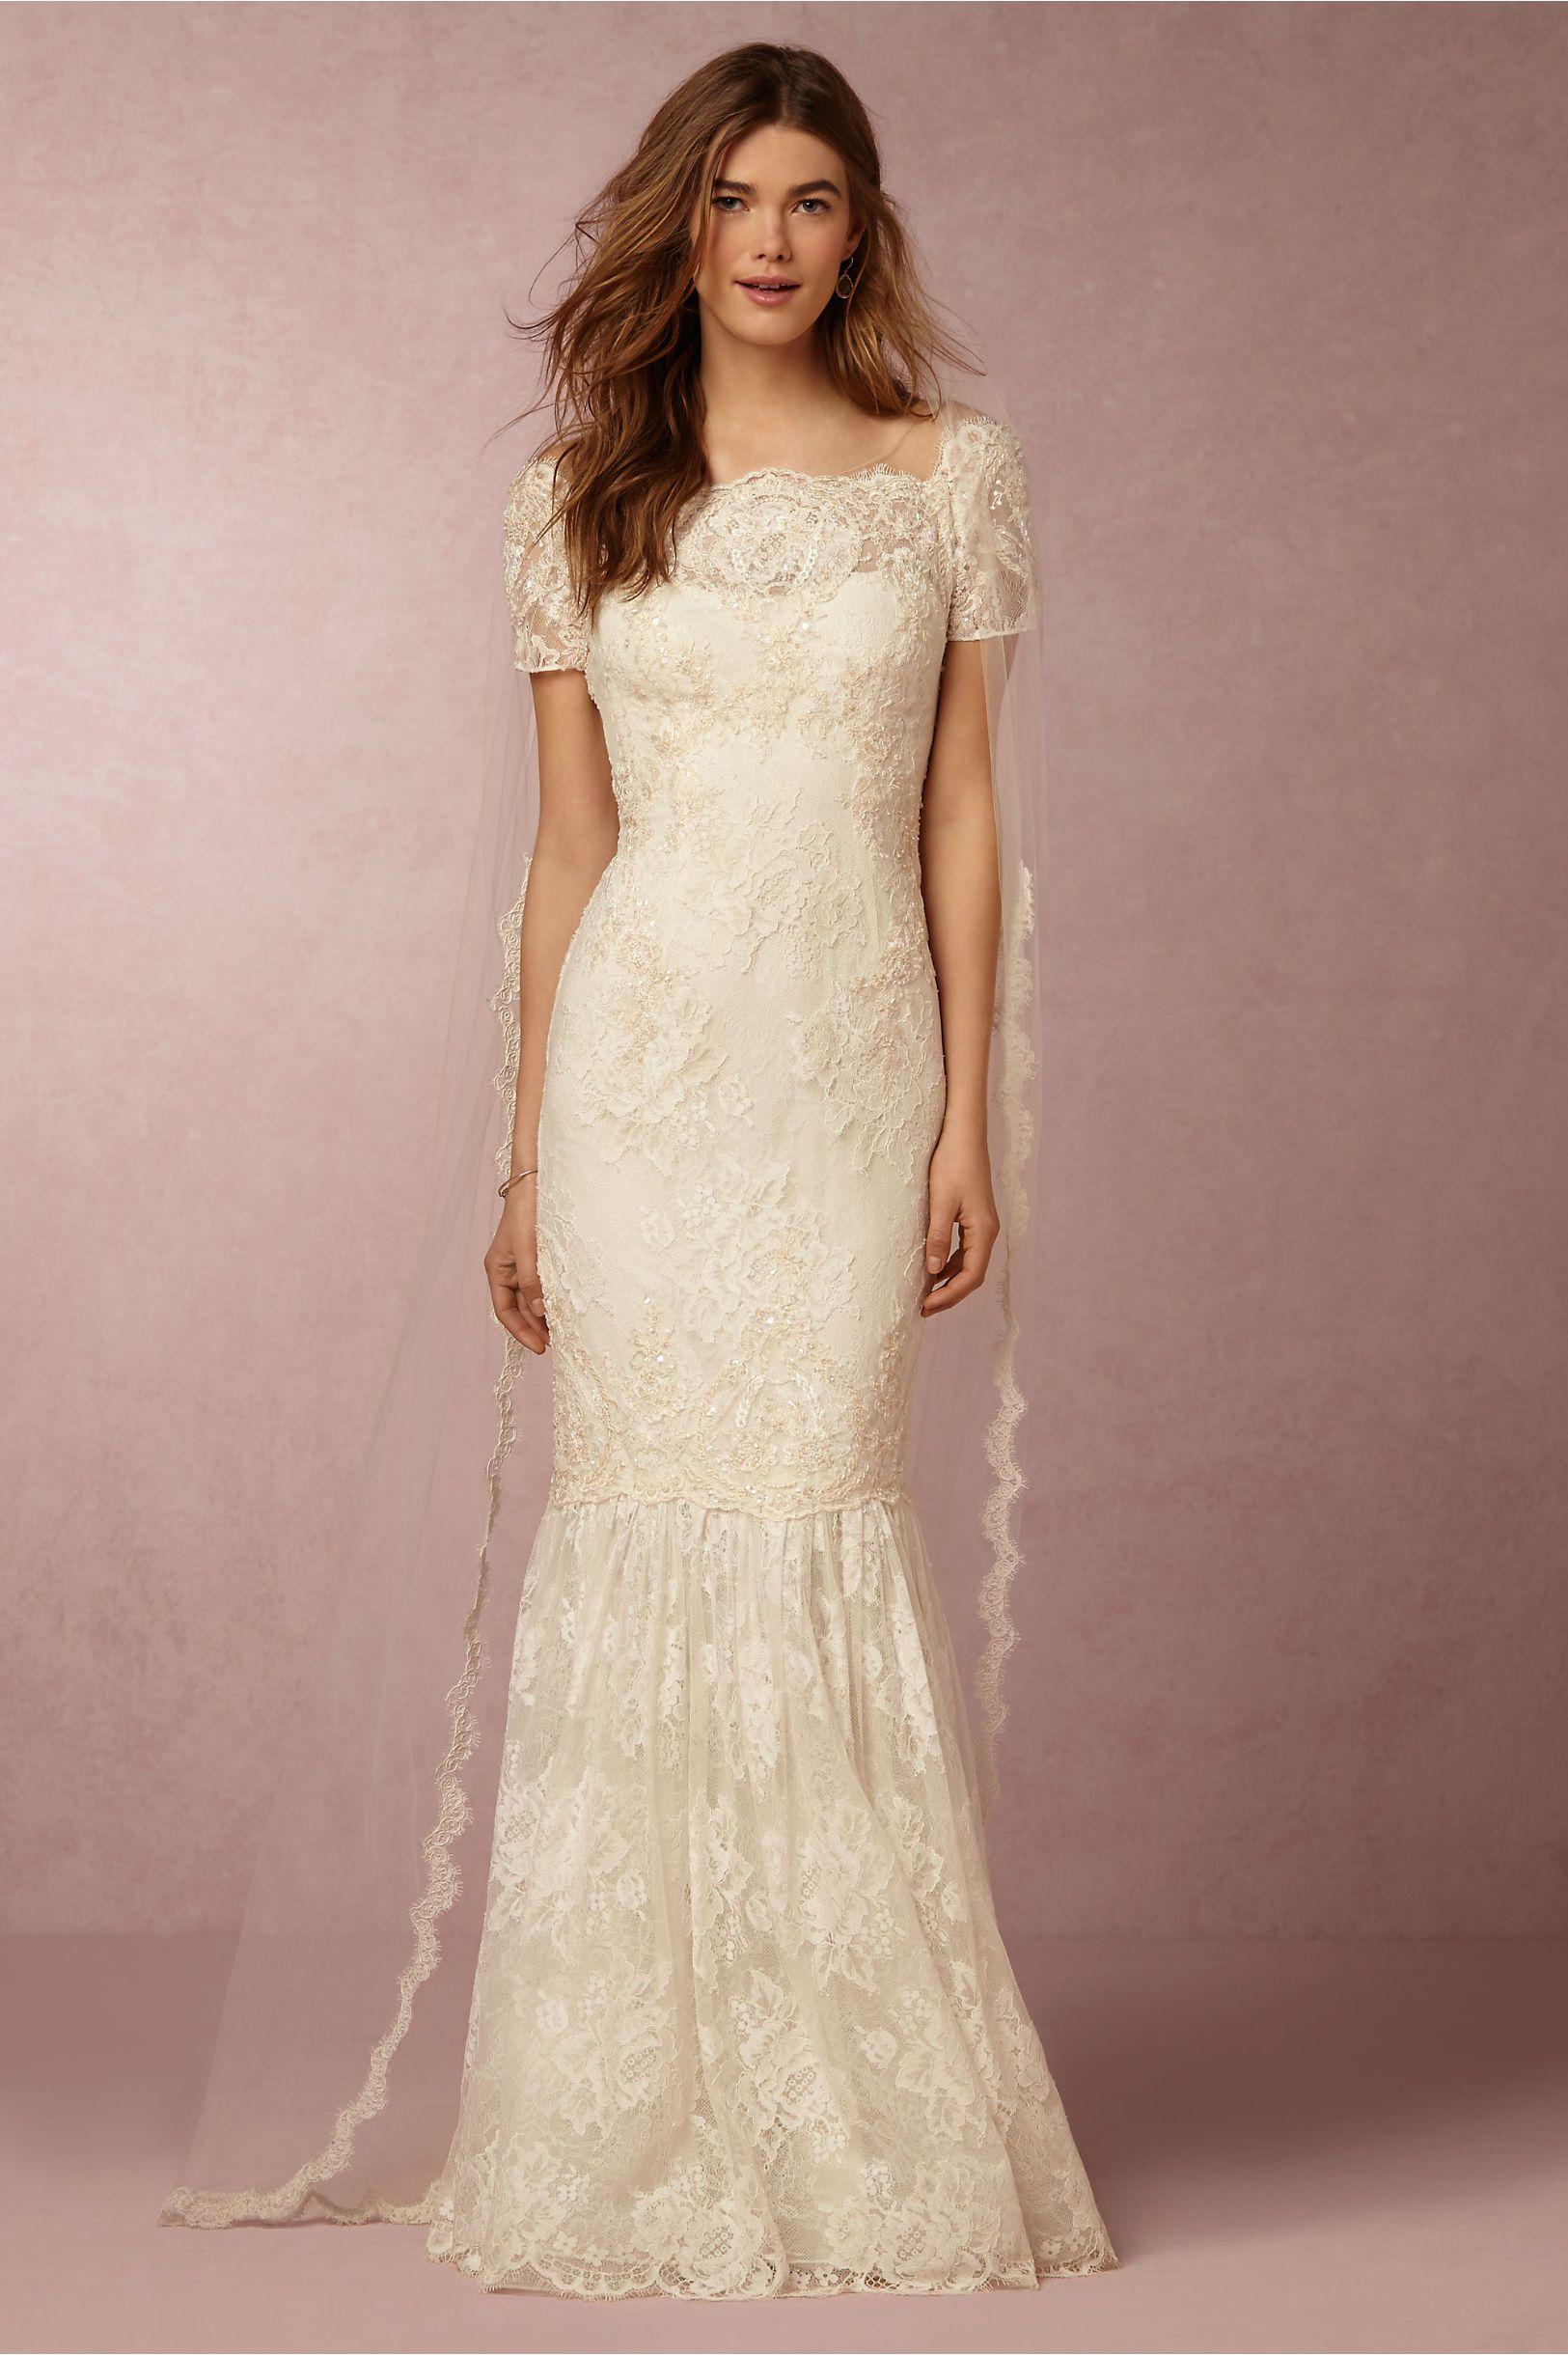 Affordable wedding dresses near me  BHLDN Ephra Gown in Sale at BHLDN  White Dresses  Pinterest